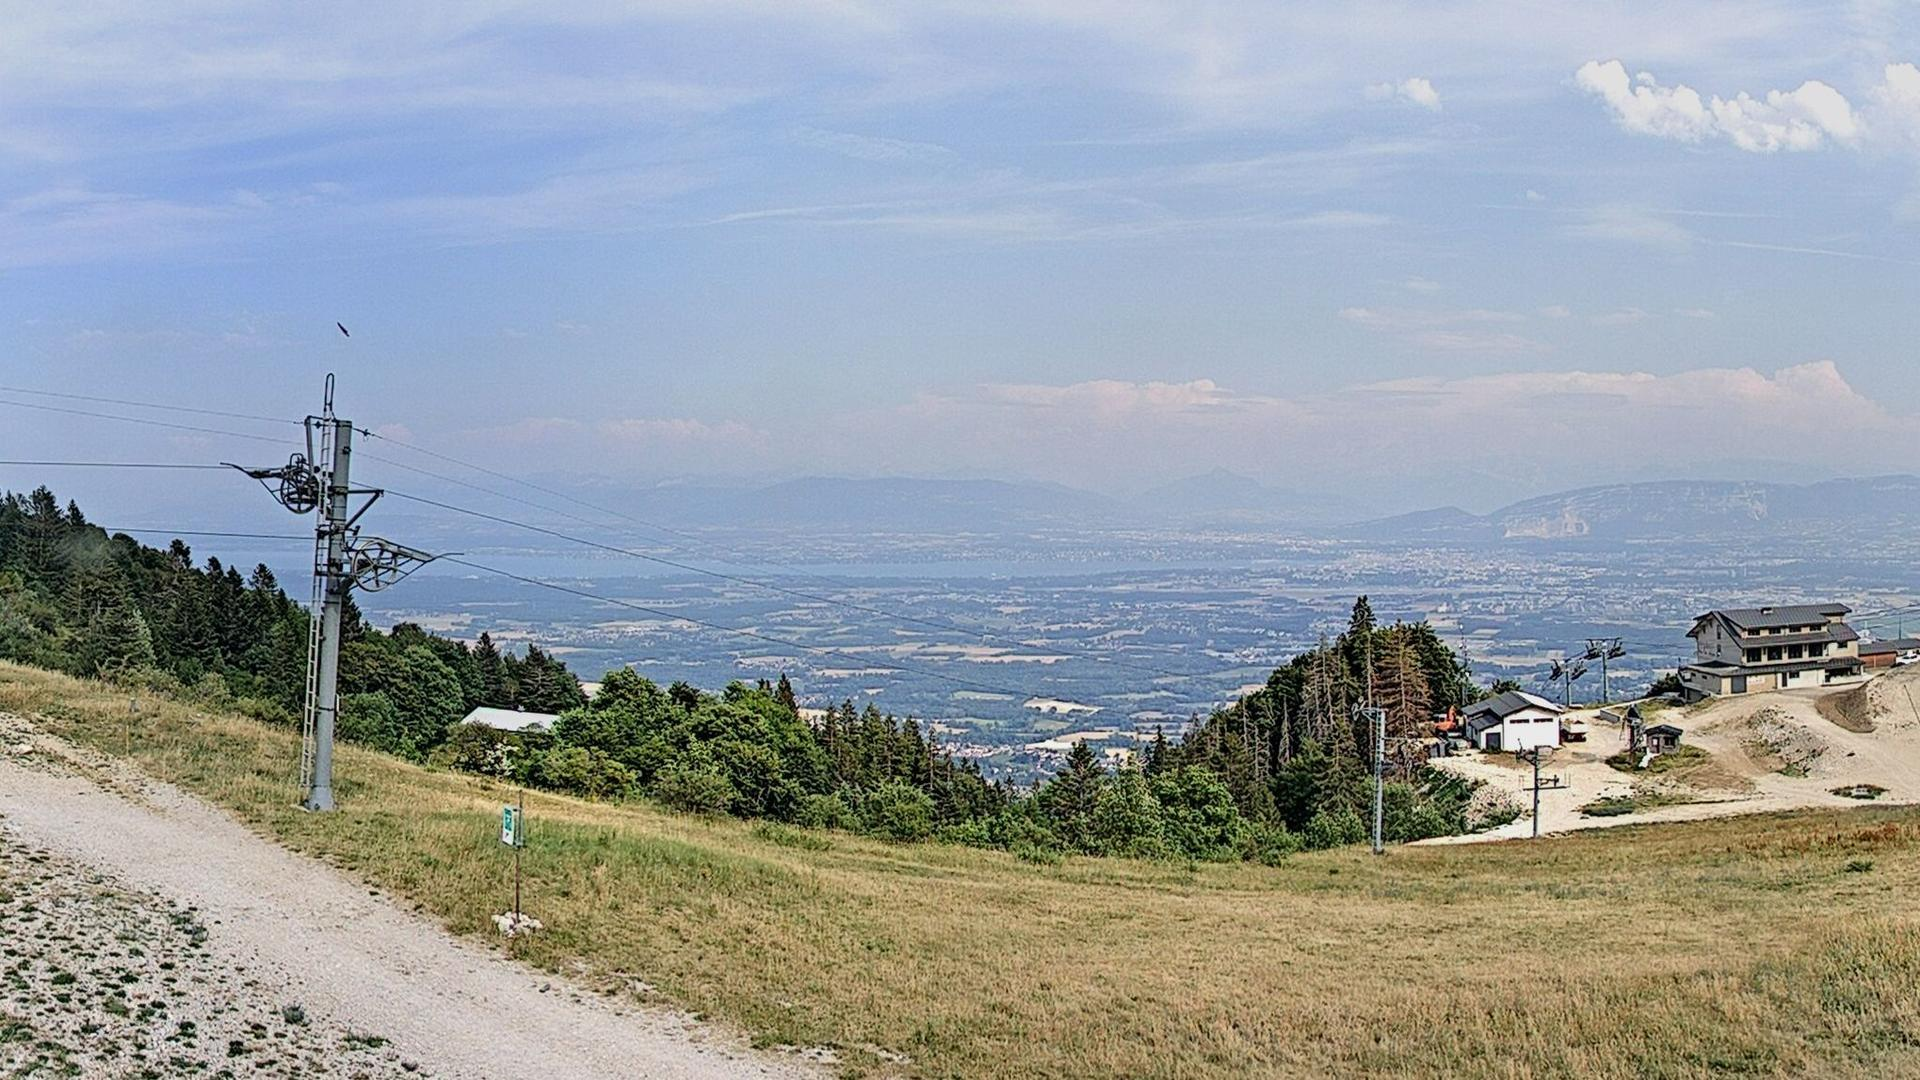 Webcam Crozet: Panoramique